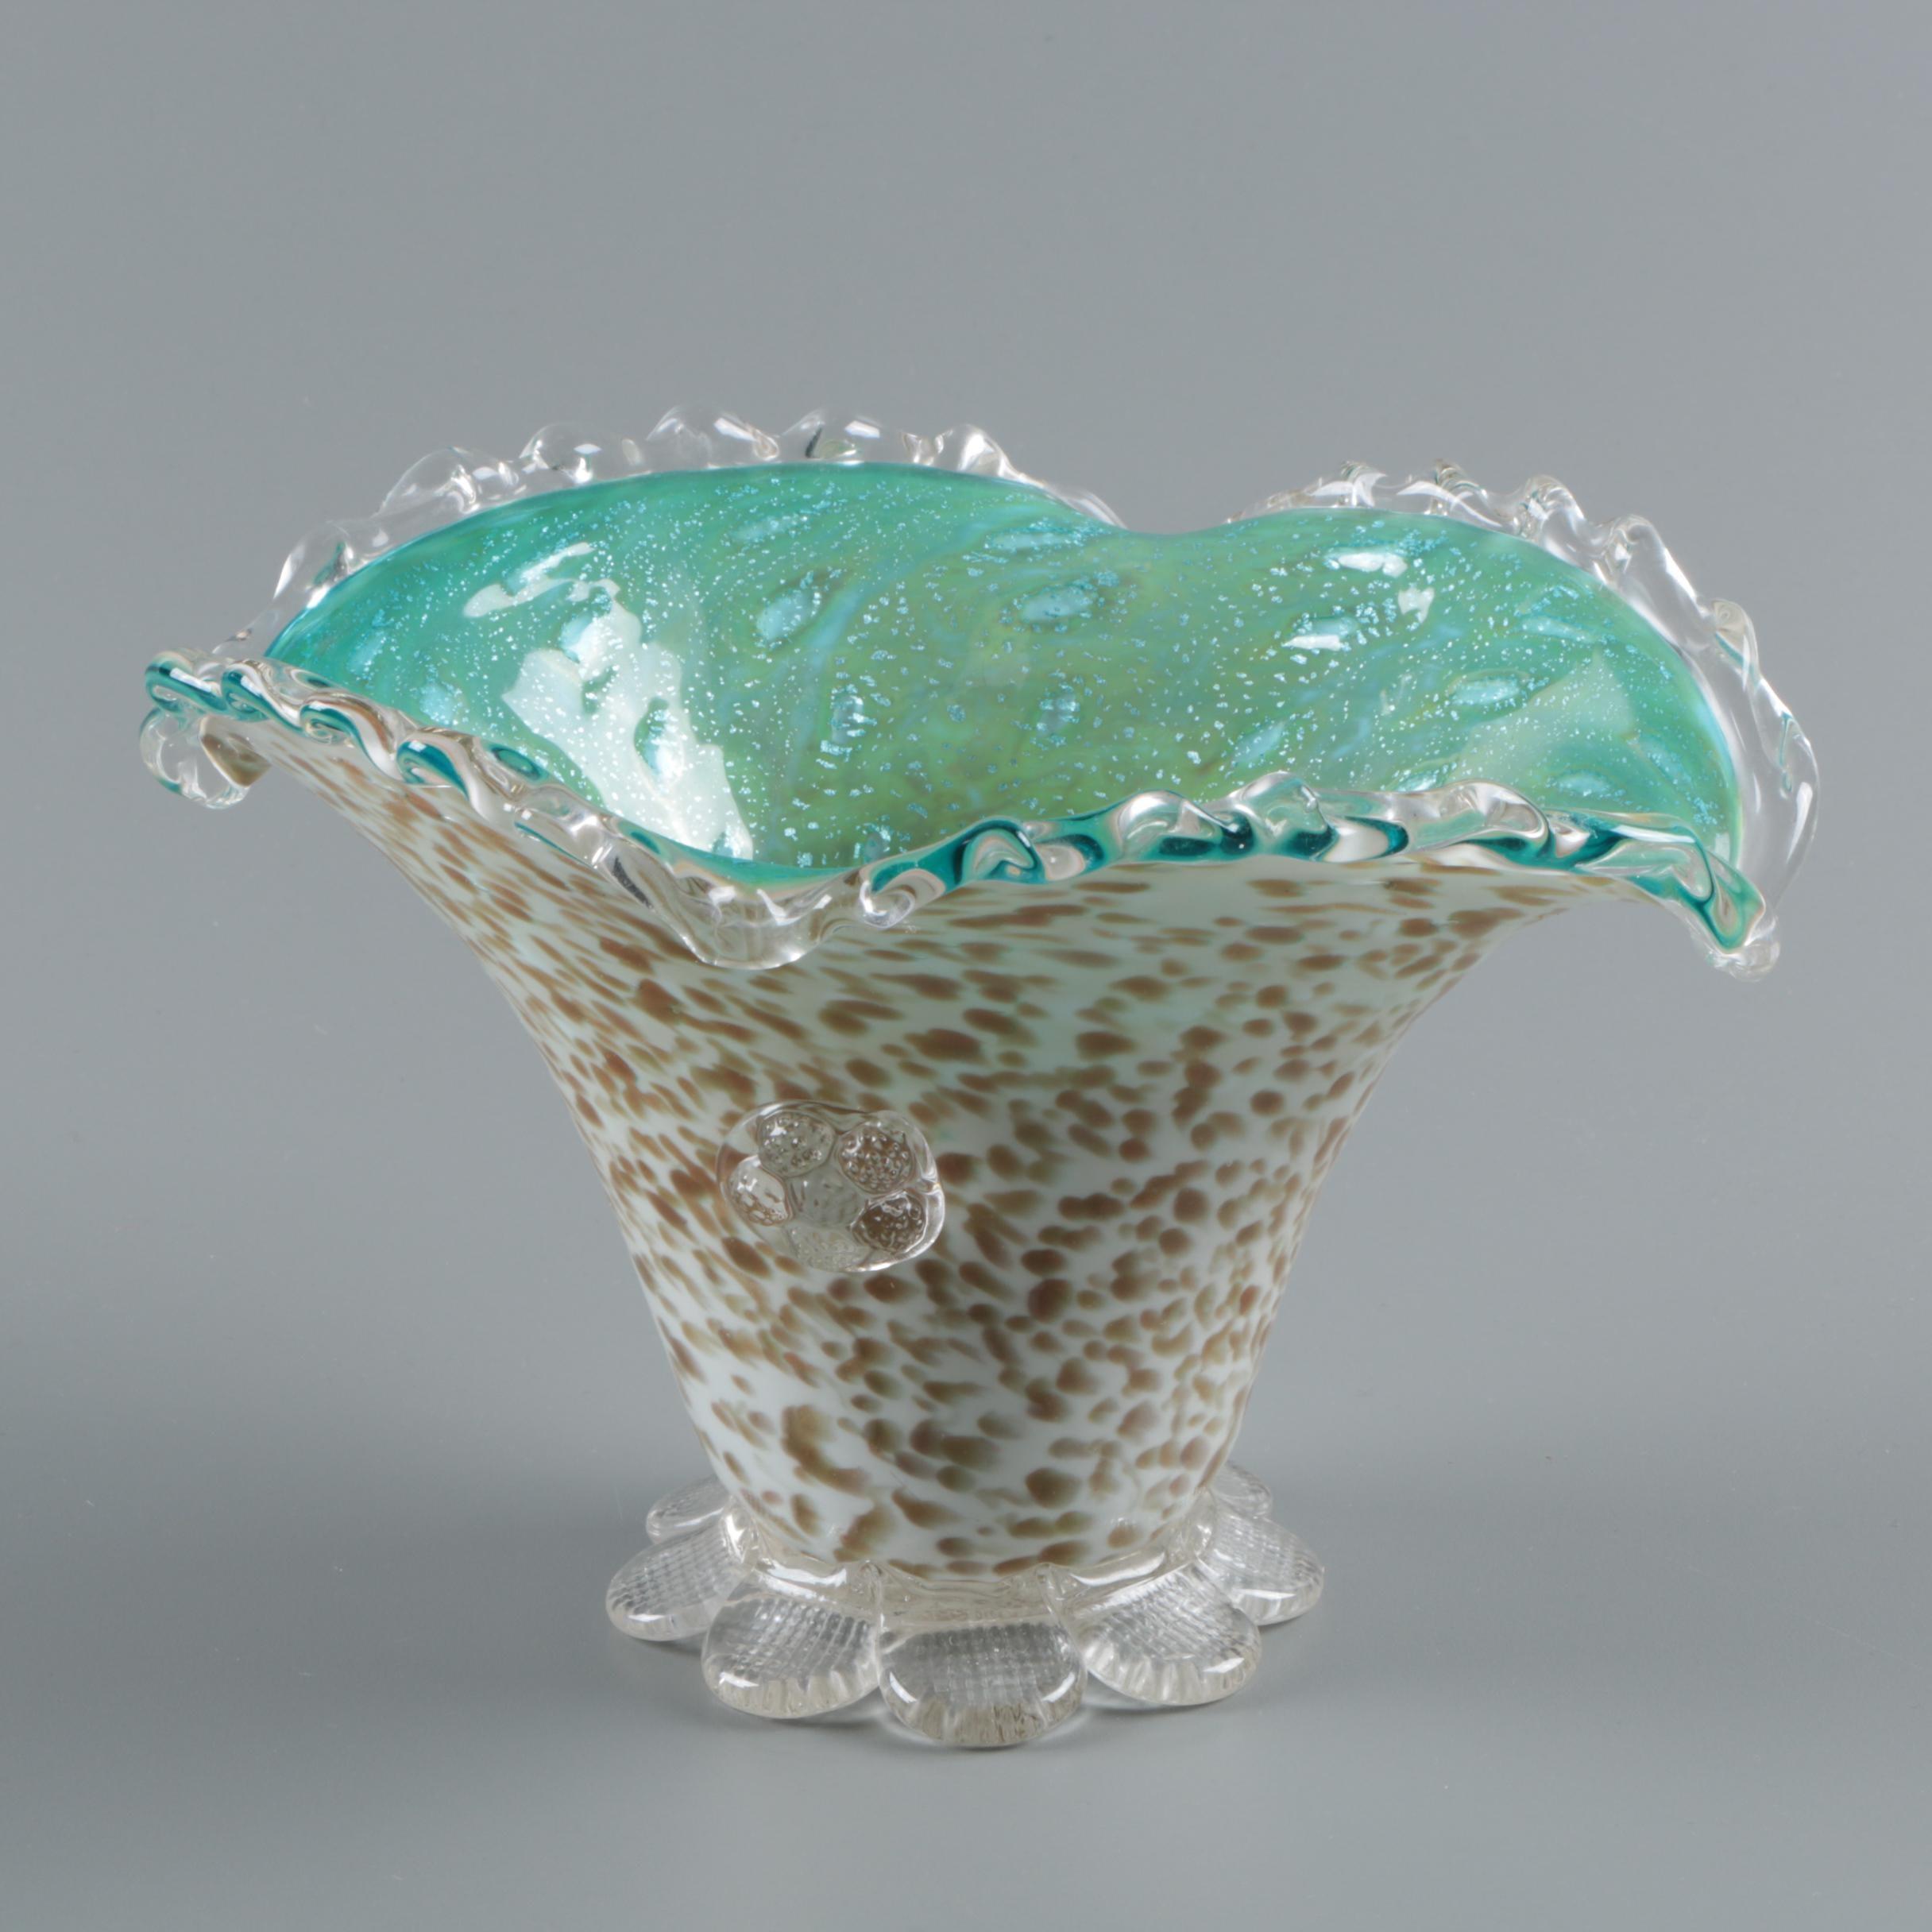 Vintage Murano Style Hand-Blown Aventurine Art Glass Vase